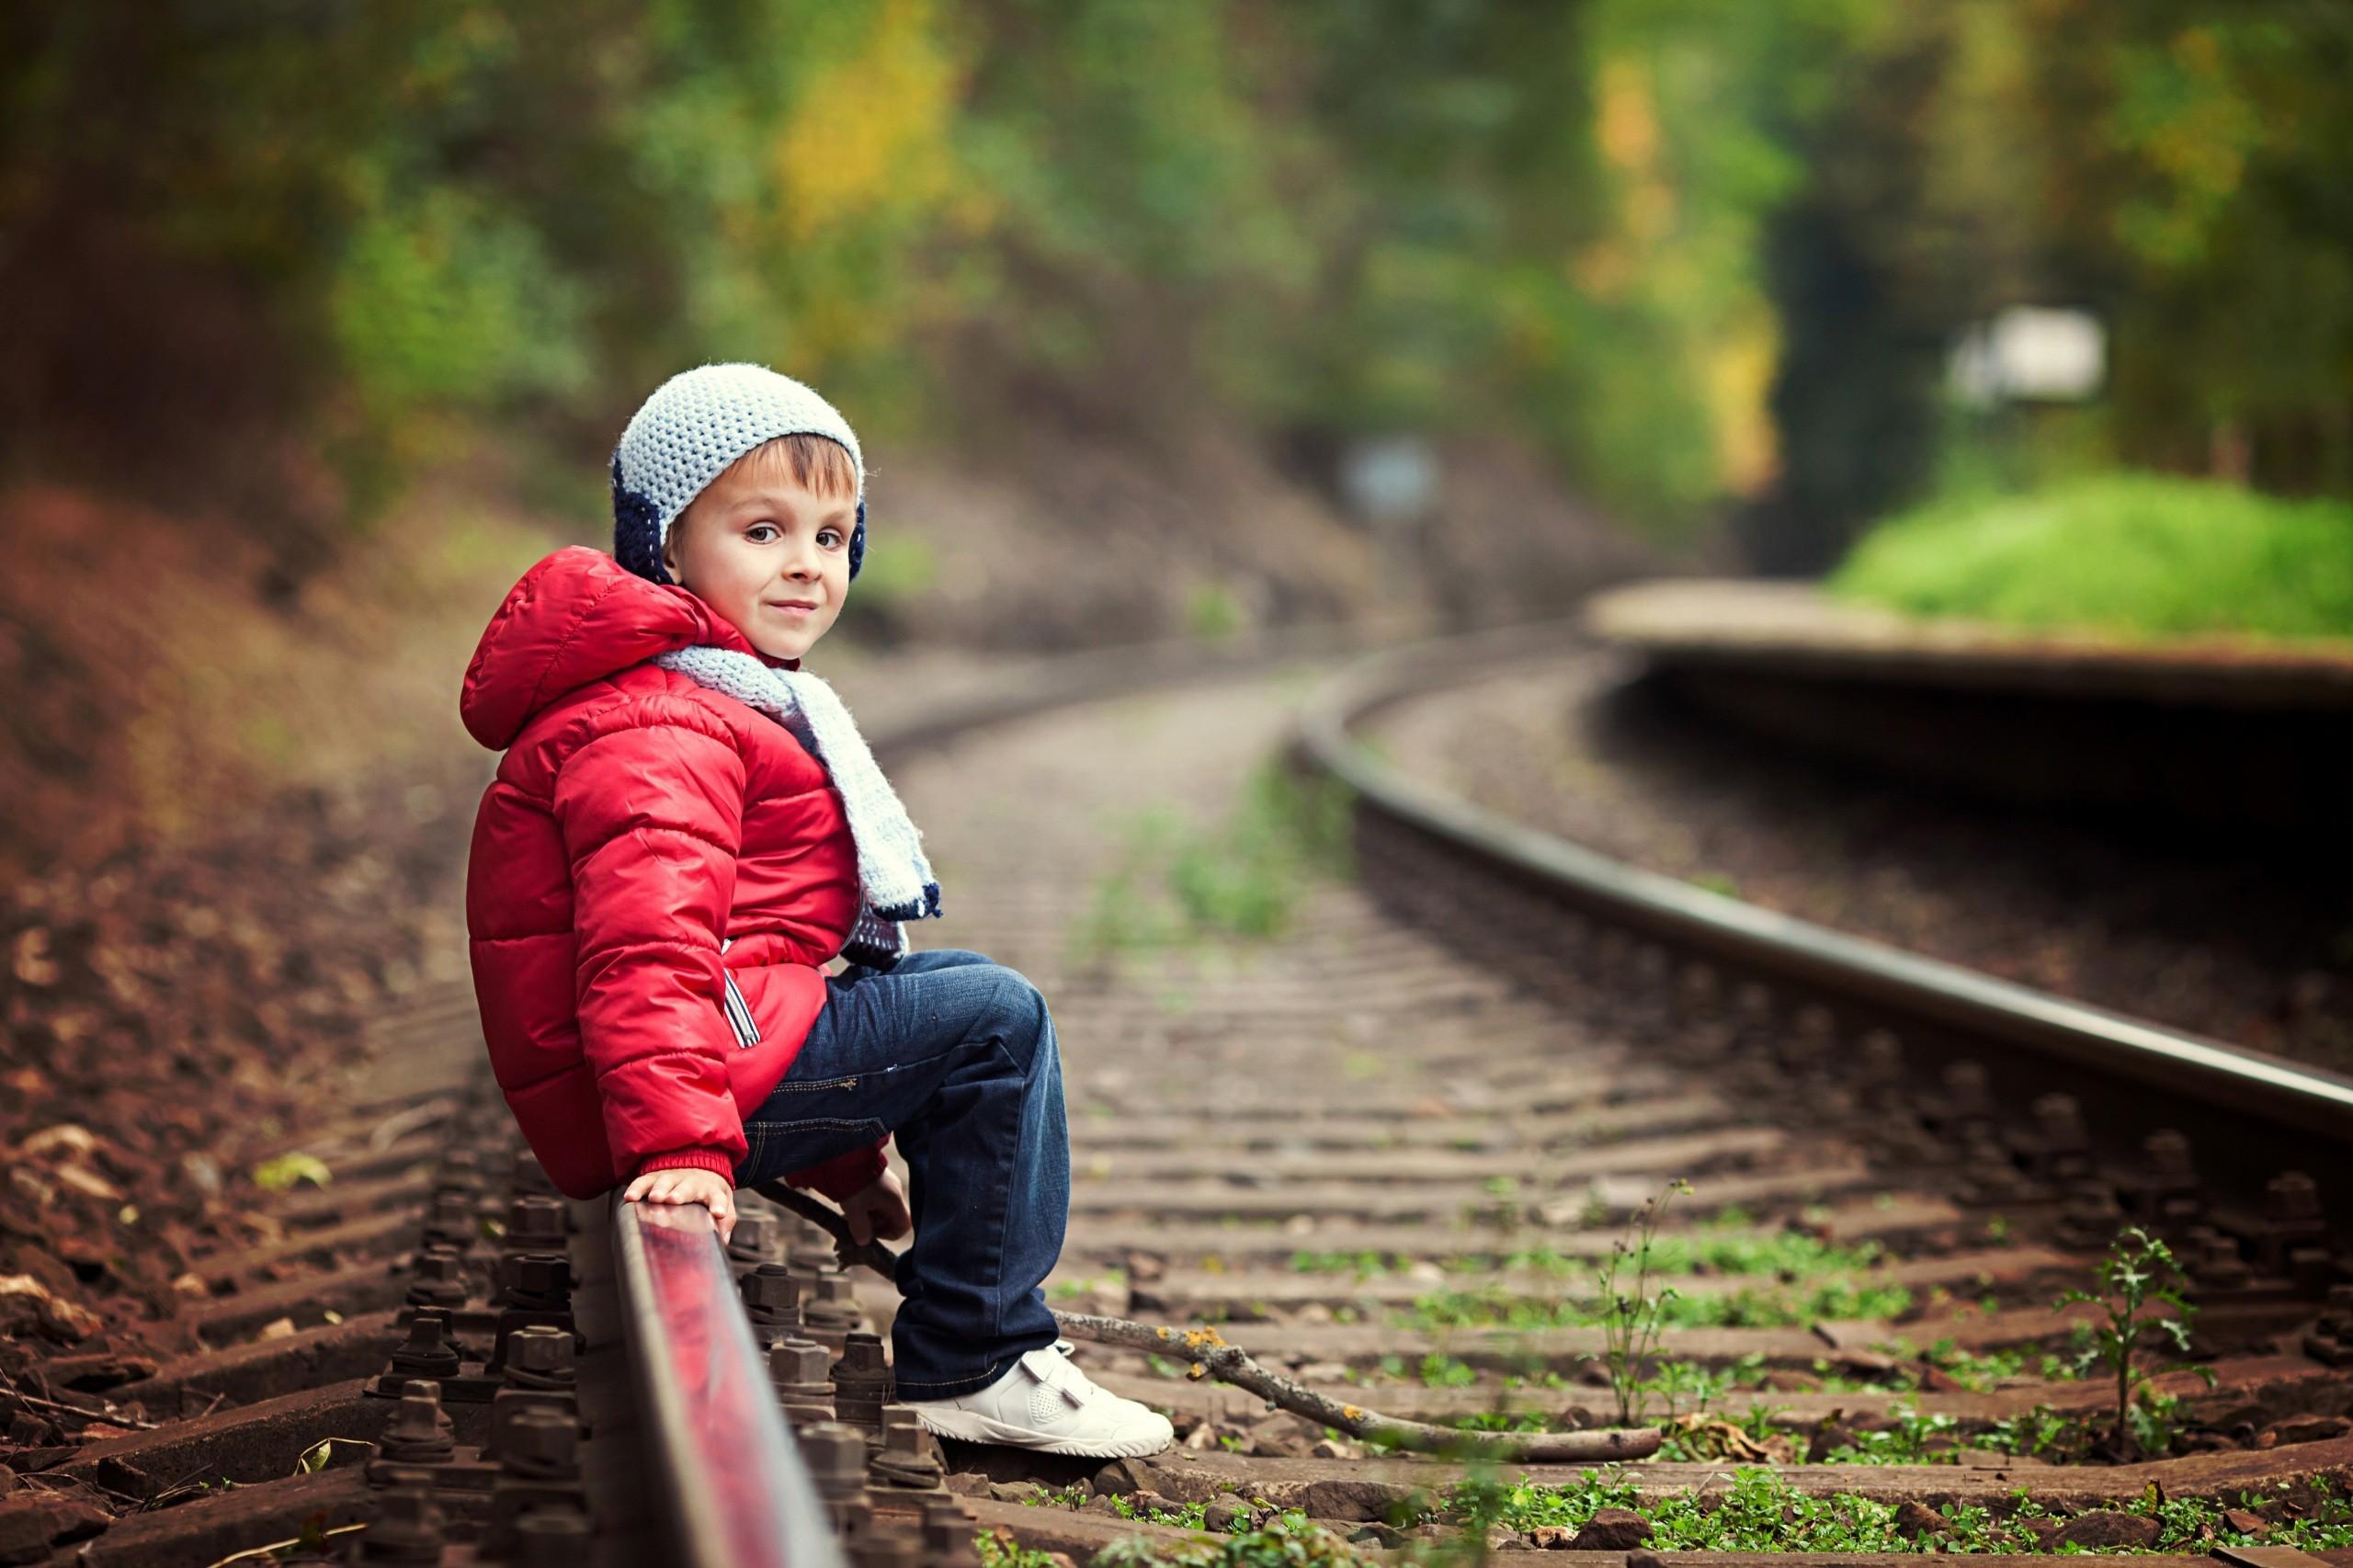 Boy Wallpaper Hd Full Size: Cute Boy Wallpaper (72+ Images